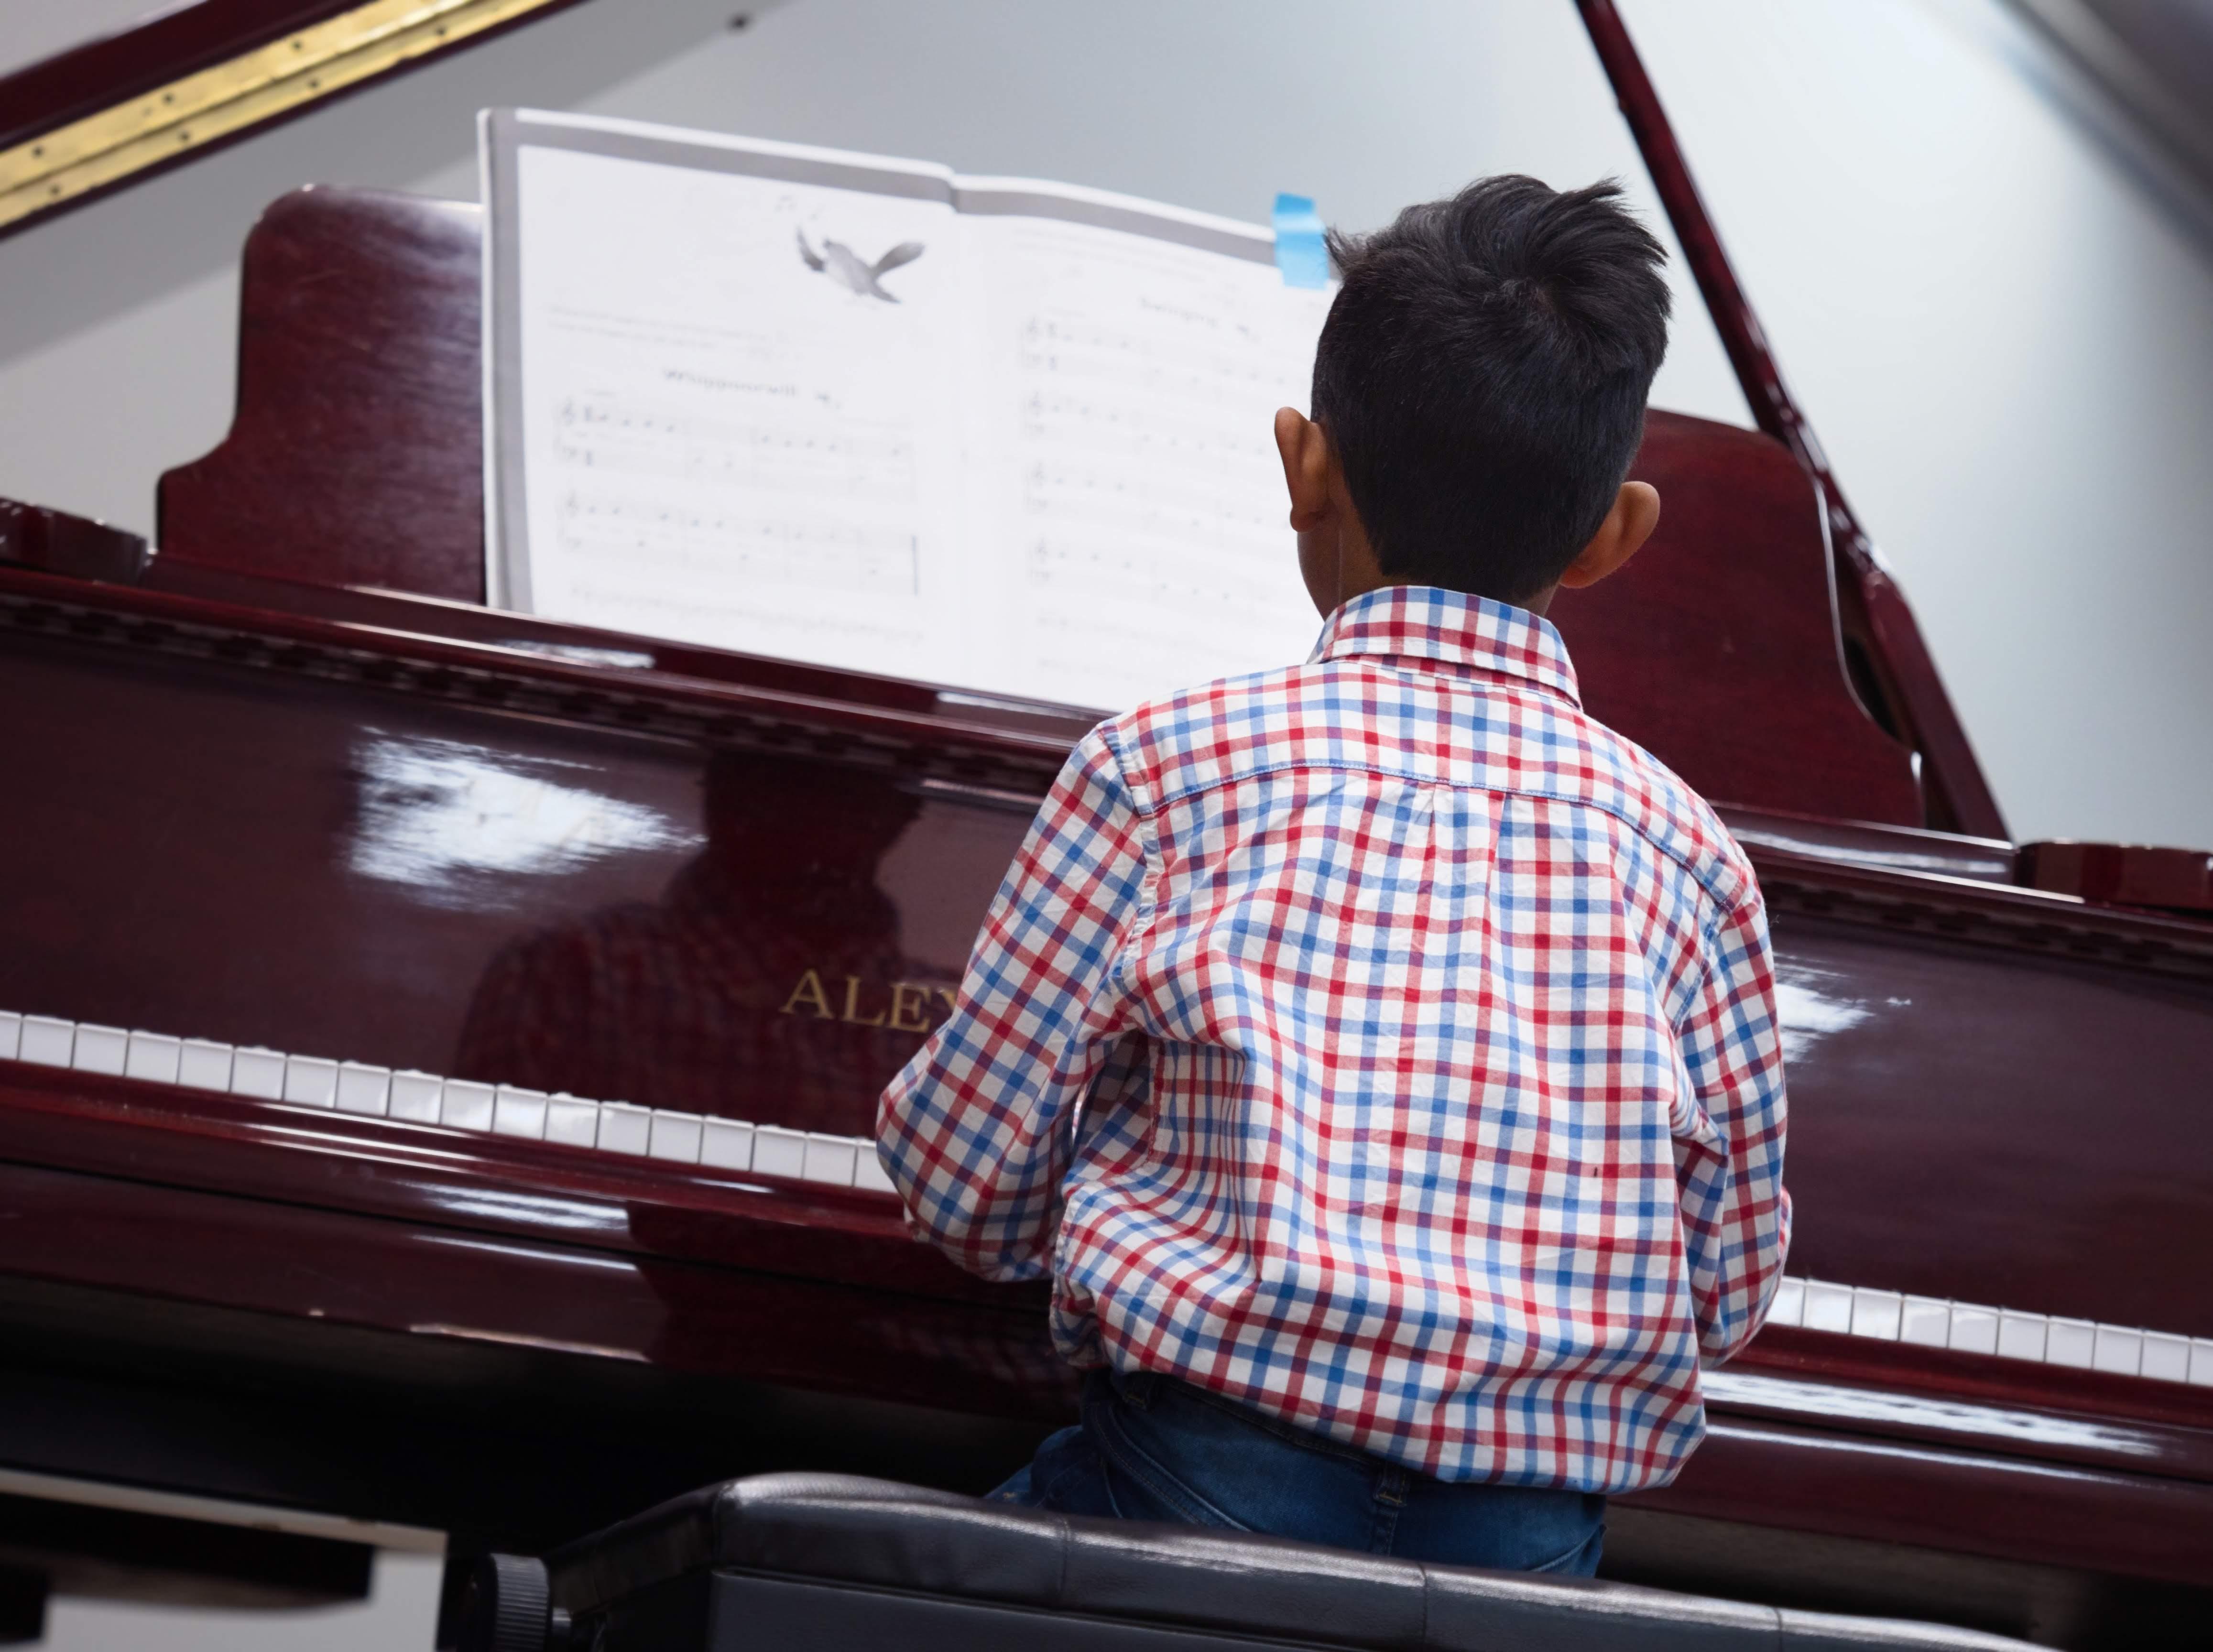 WGE Pianoforte Day 1 Sihath Weerasinghe Displays his Skills at the Piano